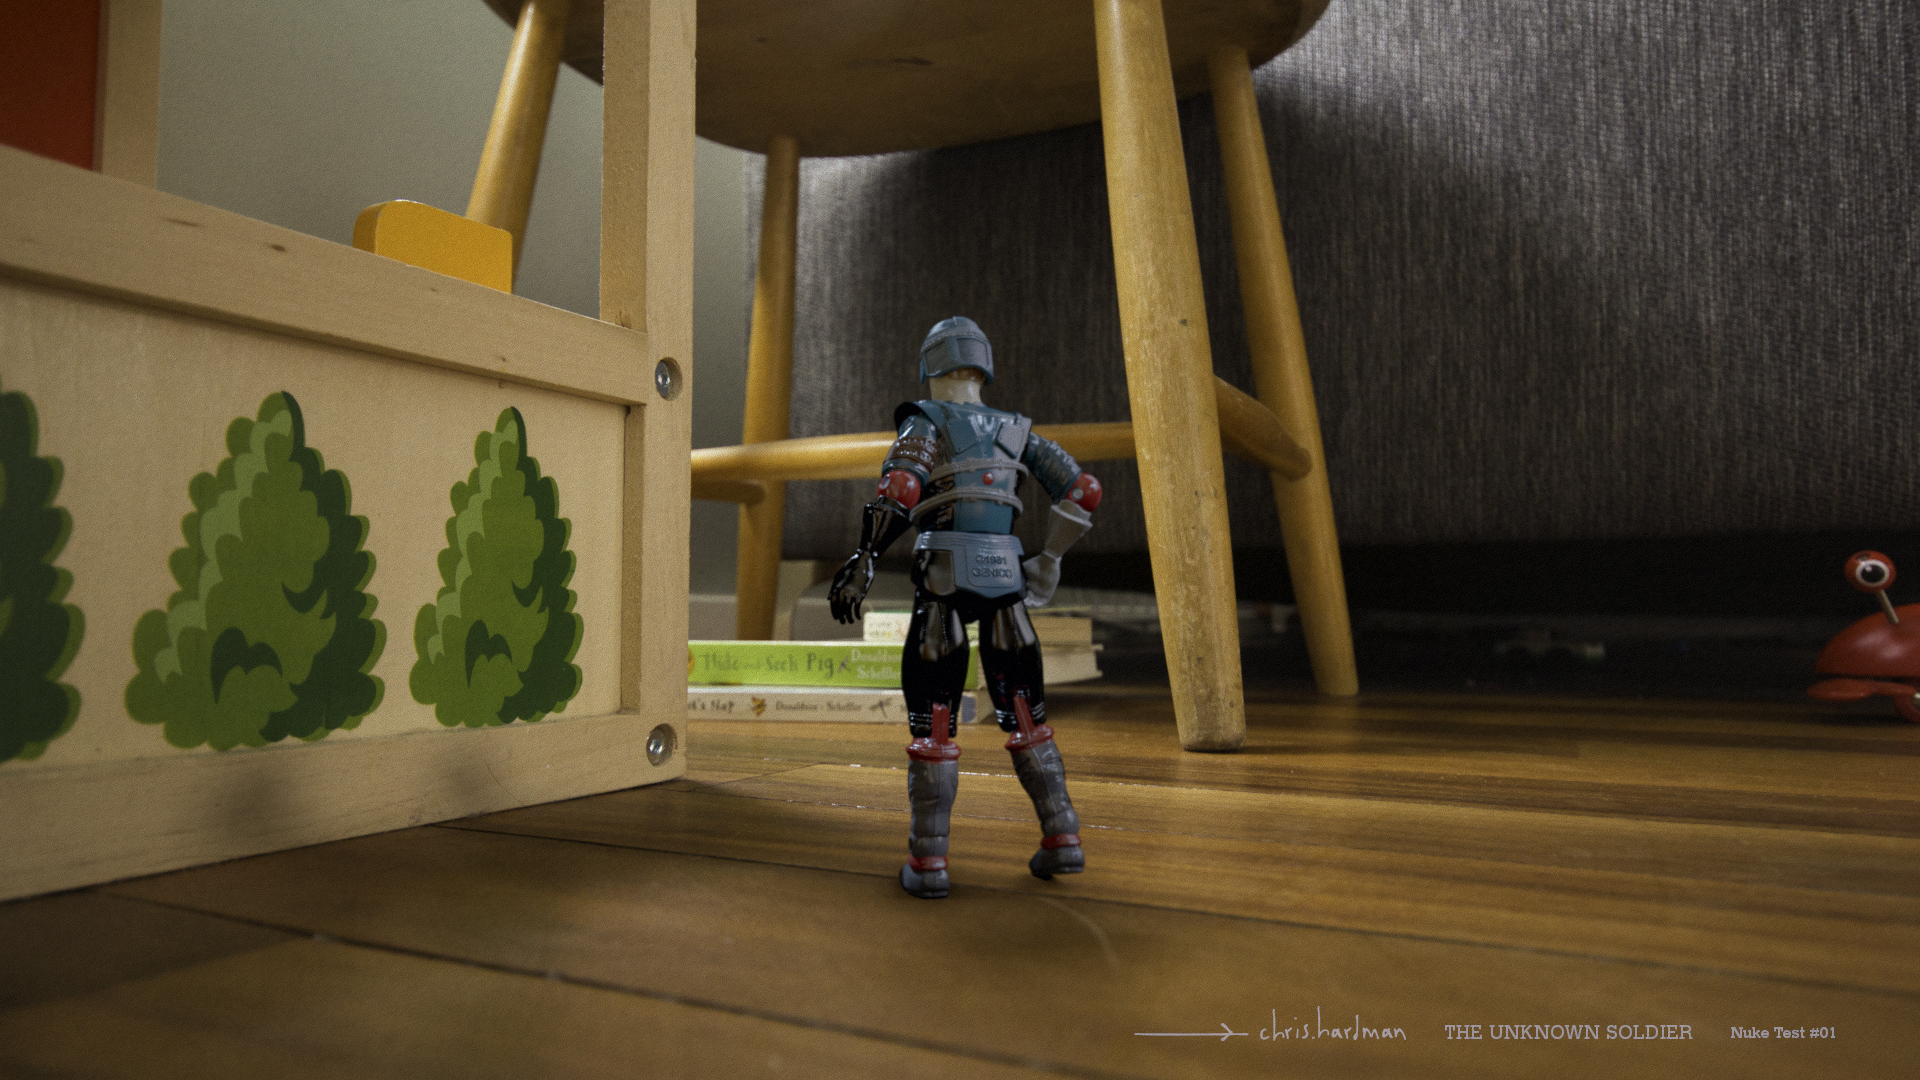 Soldier Nuke Test 01